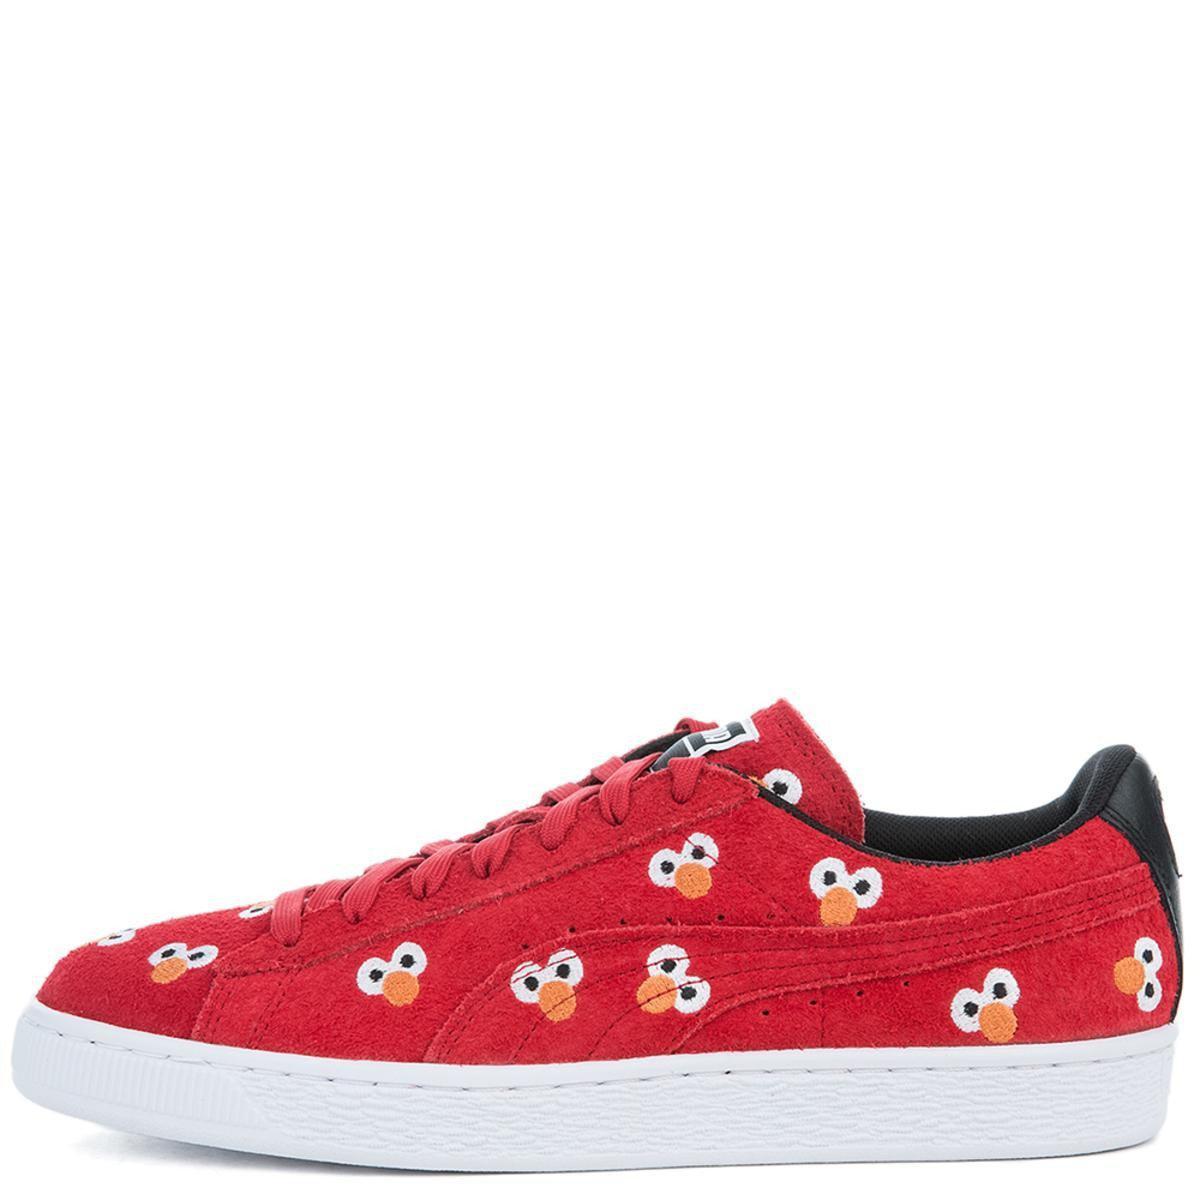 6fd098dad851bb Lyst - PUMA Unisex X Sesame Street Suede Red Sneaker in Red